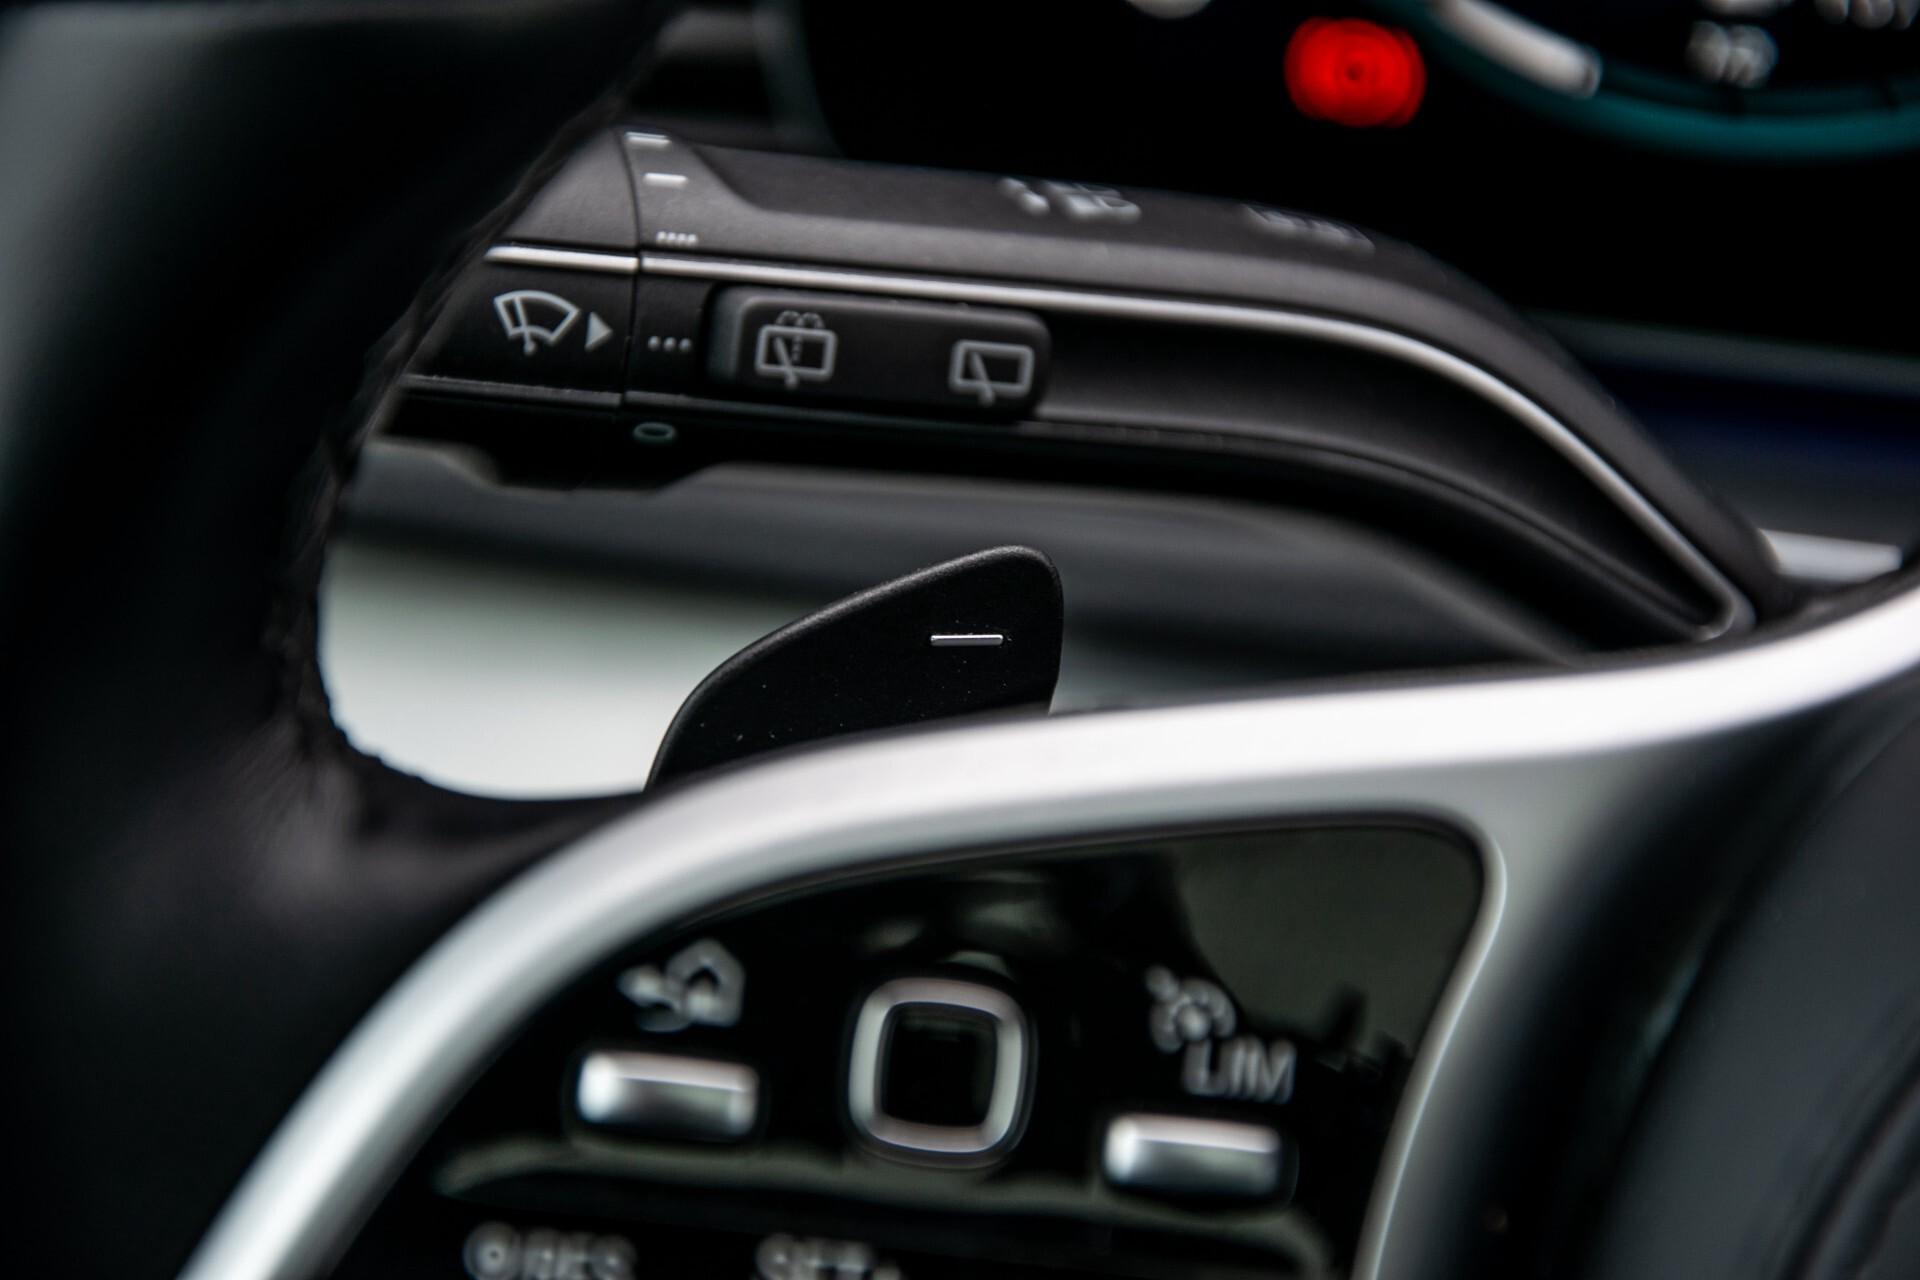 Mercedes-Benz GLE 450 4-M 7-Persoons AMG Massage/Rij-assist/Keyless/TV/360/Night/Trekhaak Aut9 Foto 13